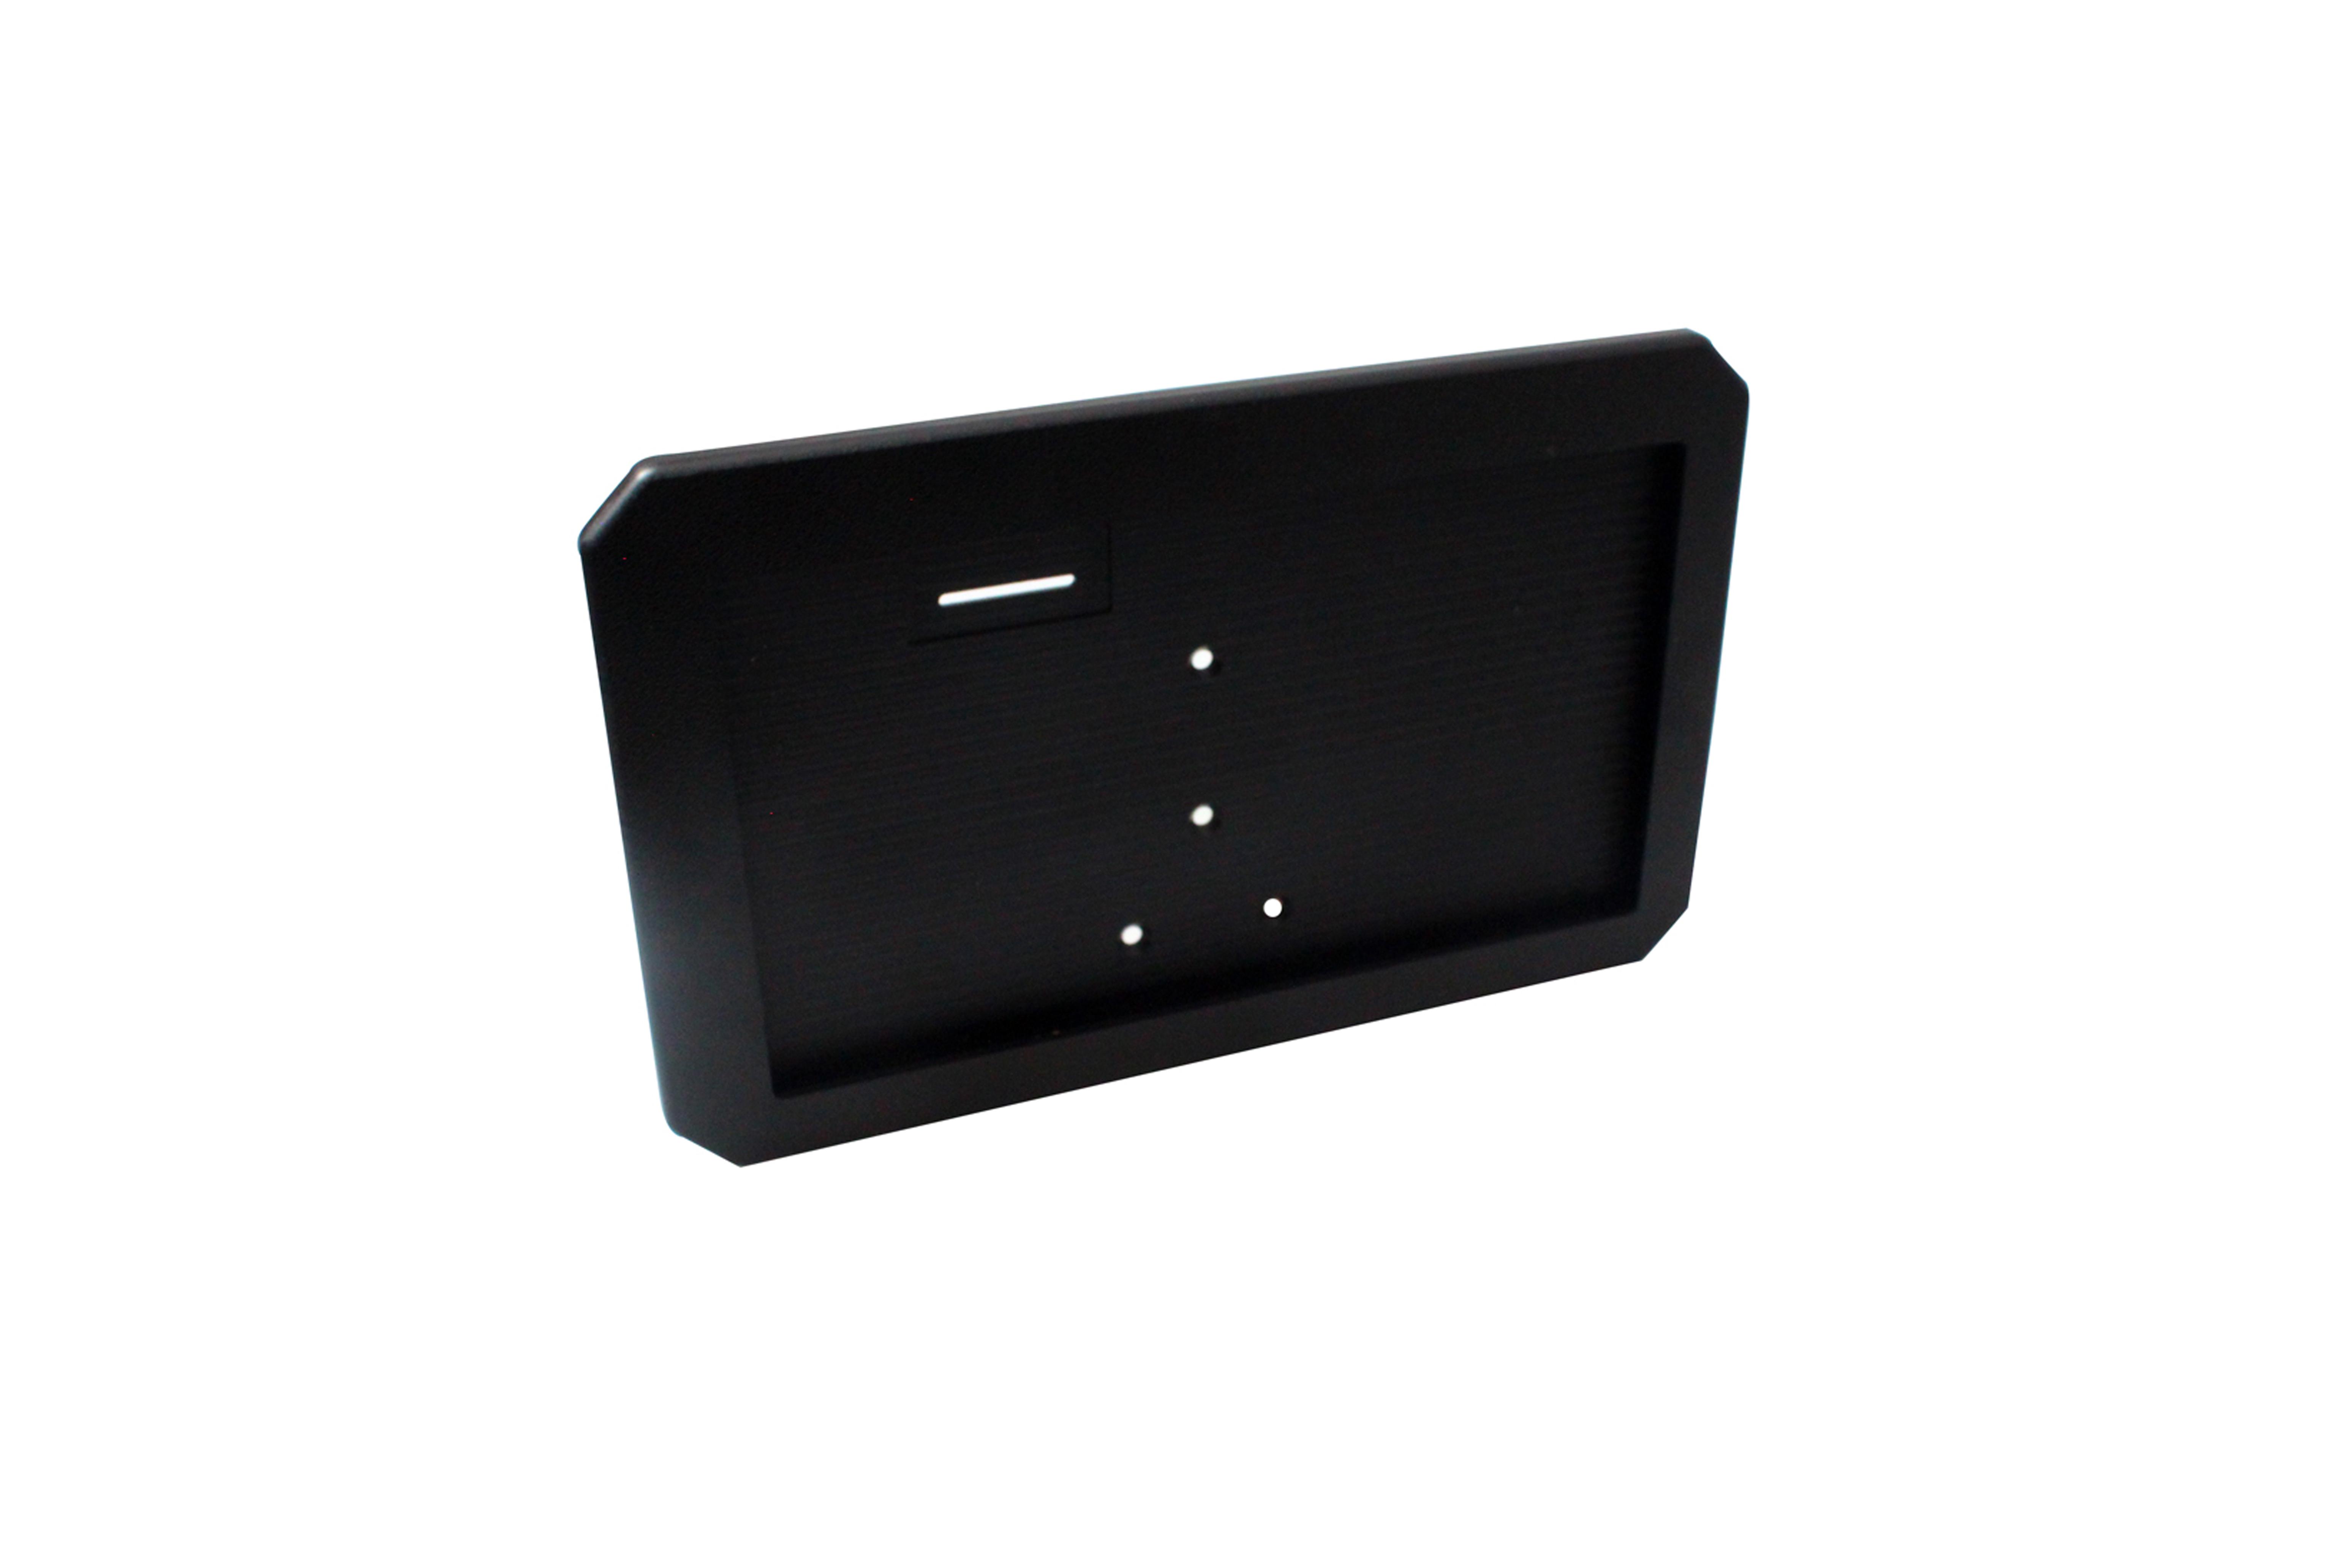 LattePanda Case scheda e schermo - Nero